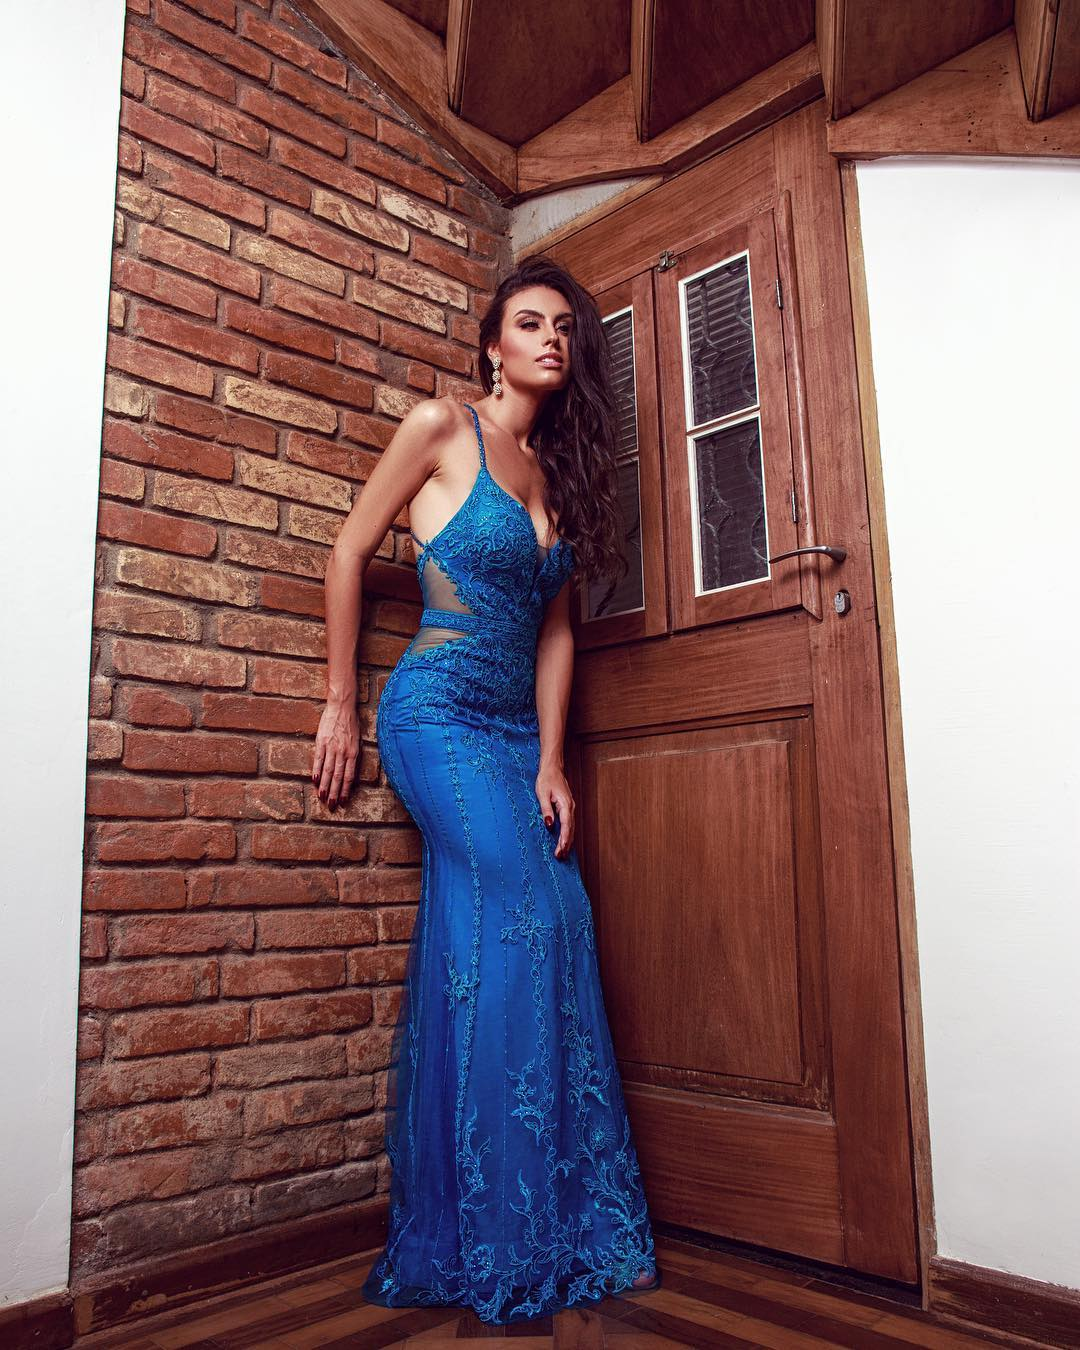 marjorie marcelle, top 5 de miss grand international 2019. - Página 2 51947712